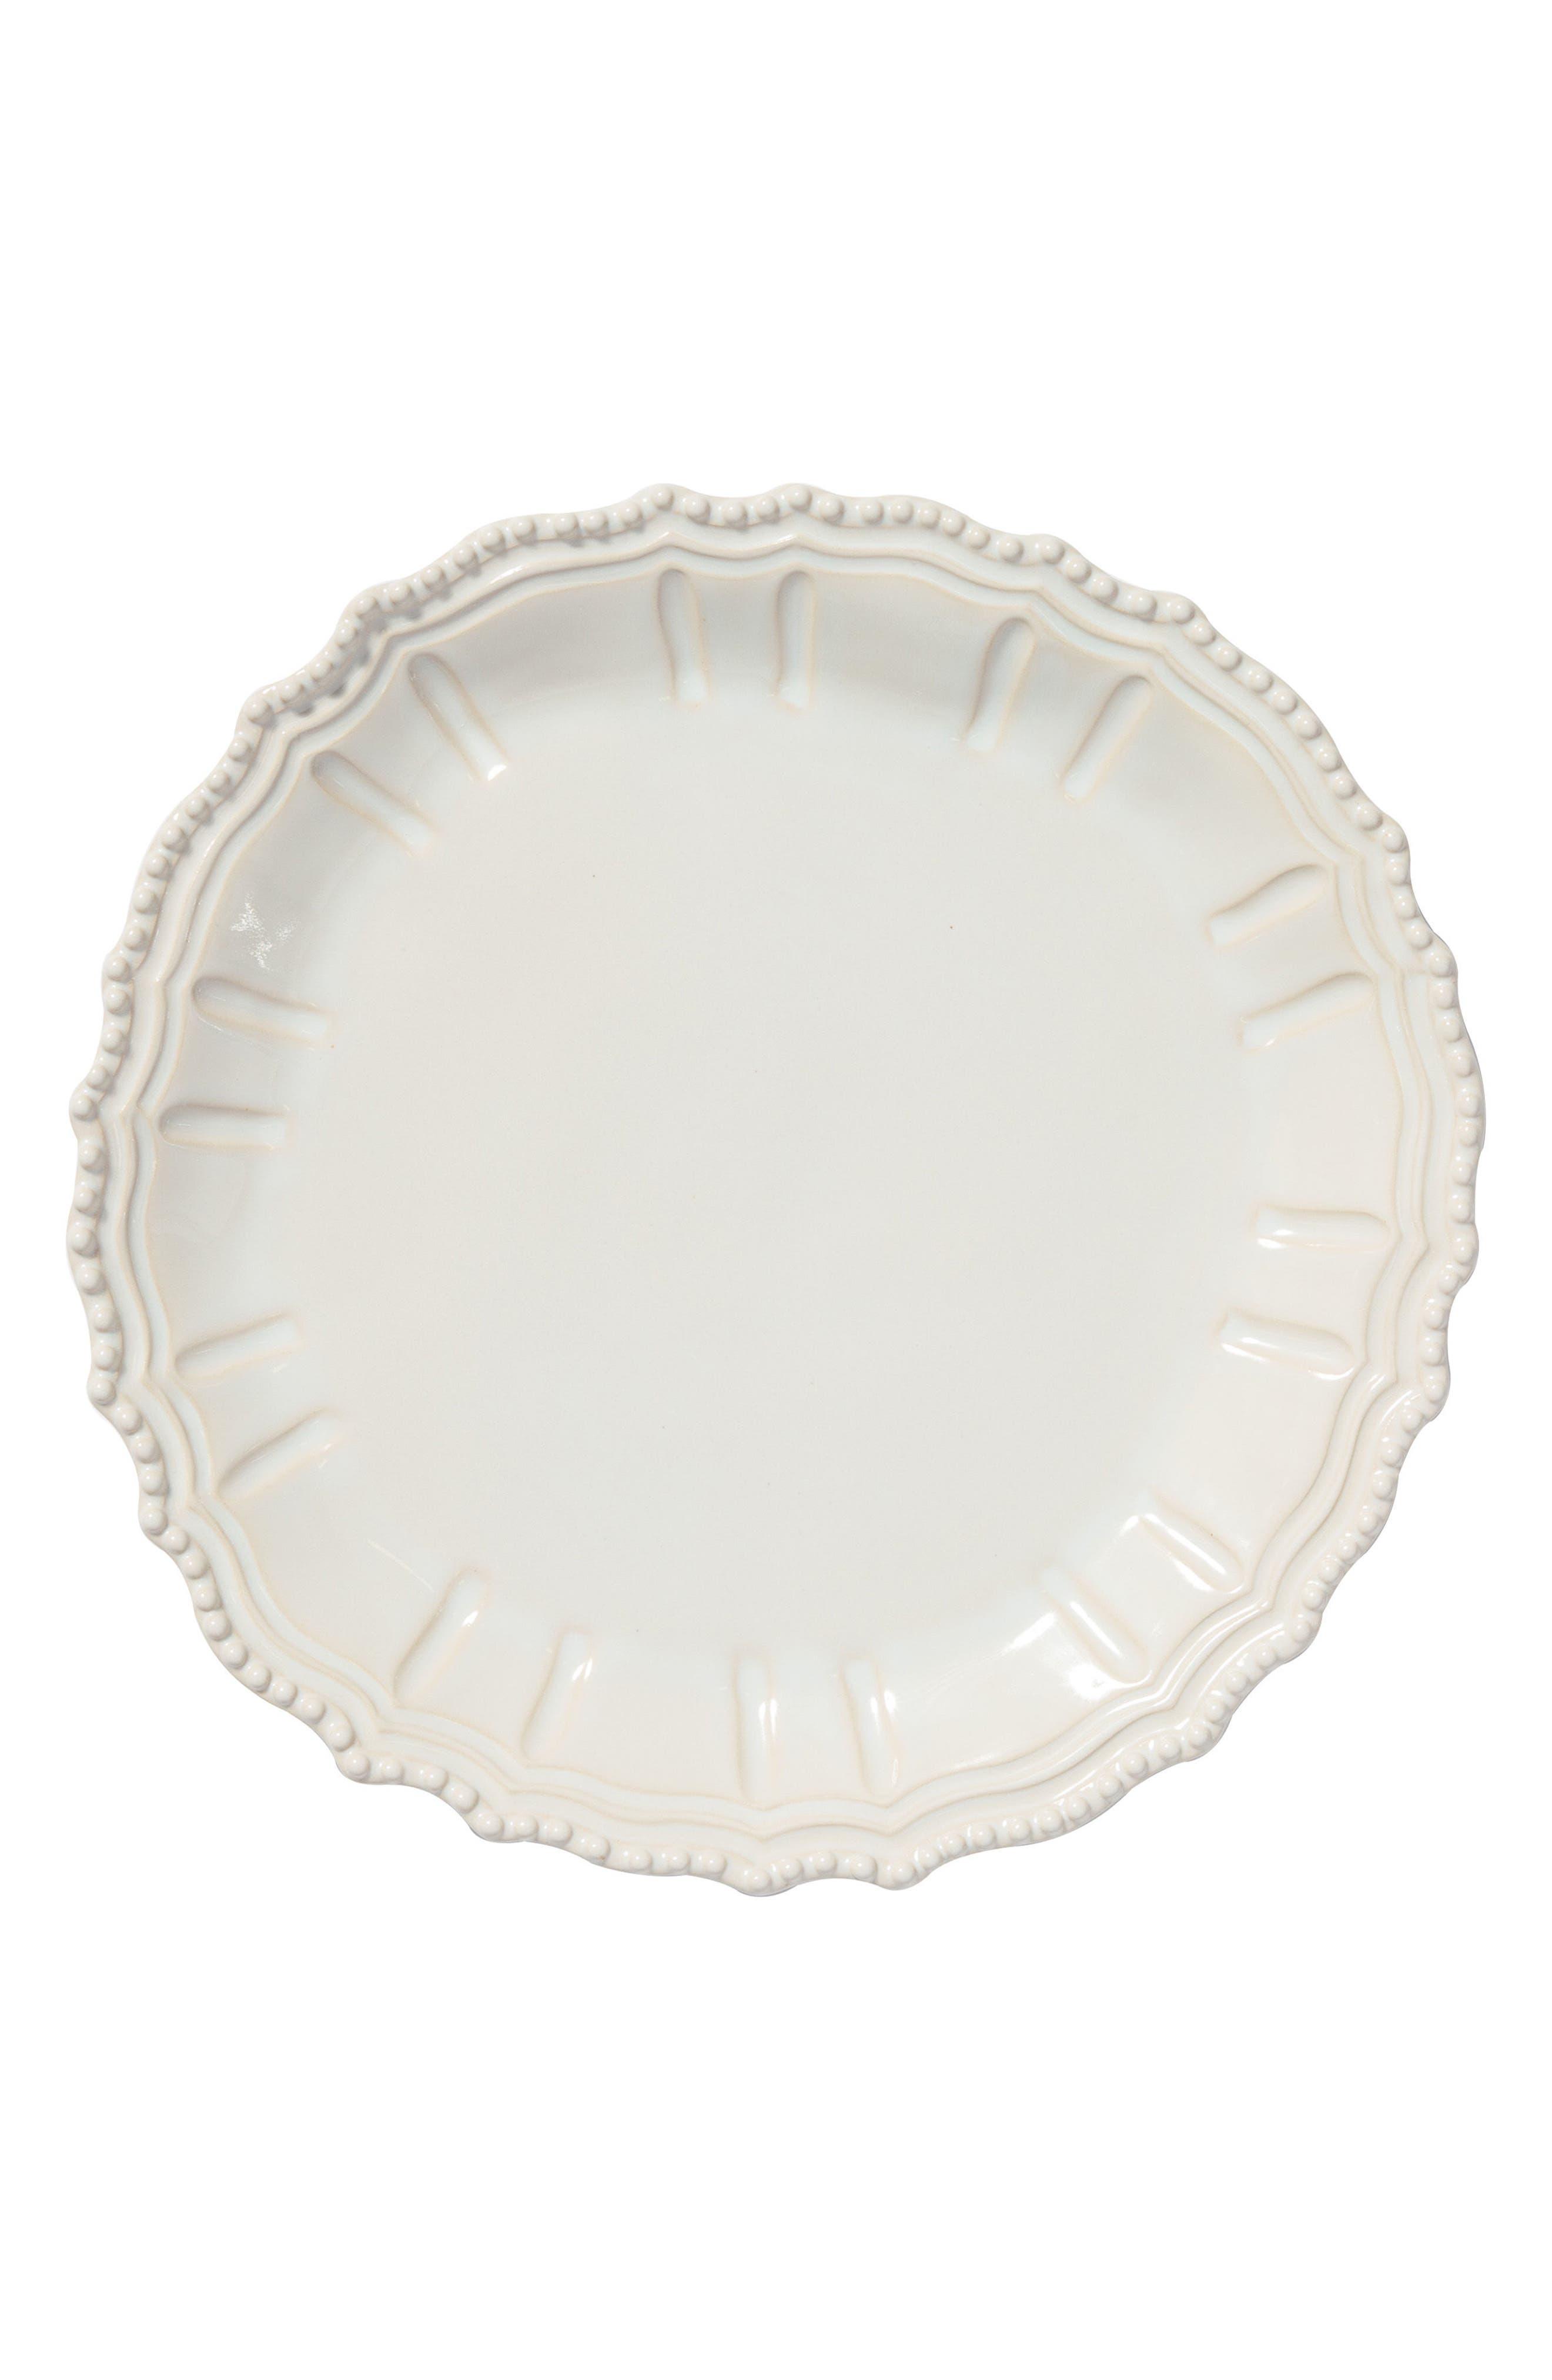 Incanto Stone Baroque Platter,                             Main thumbnail 1, color,                             WHITE